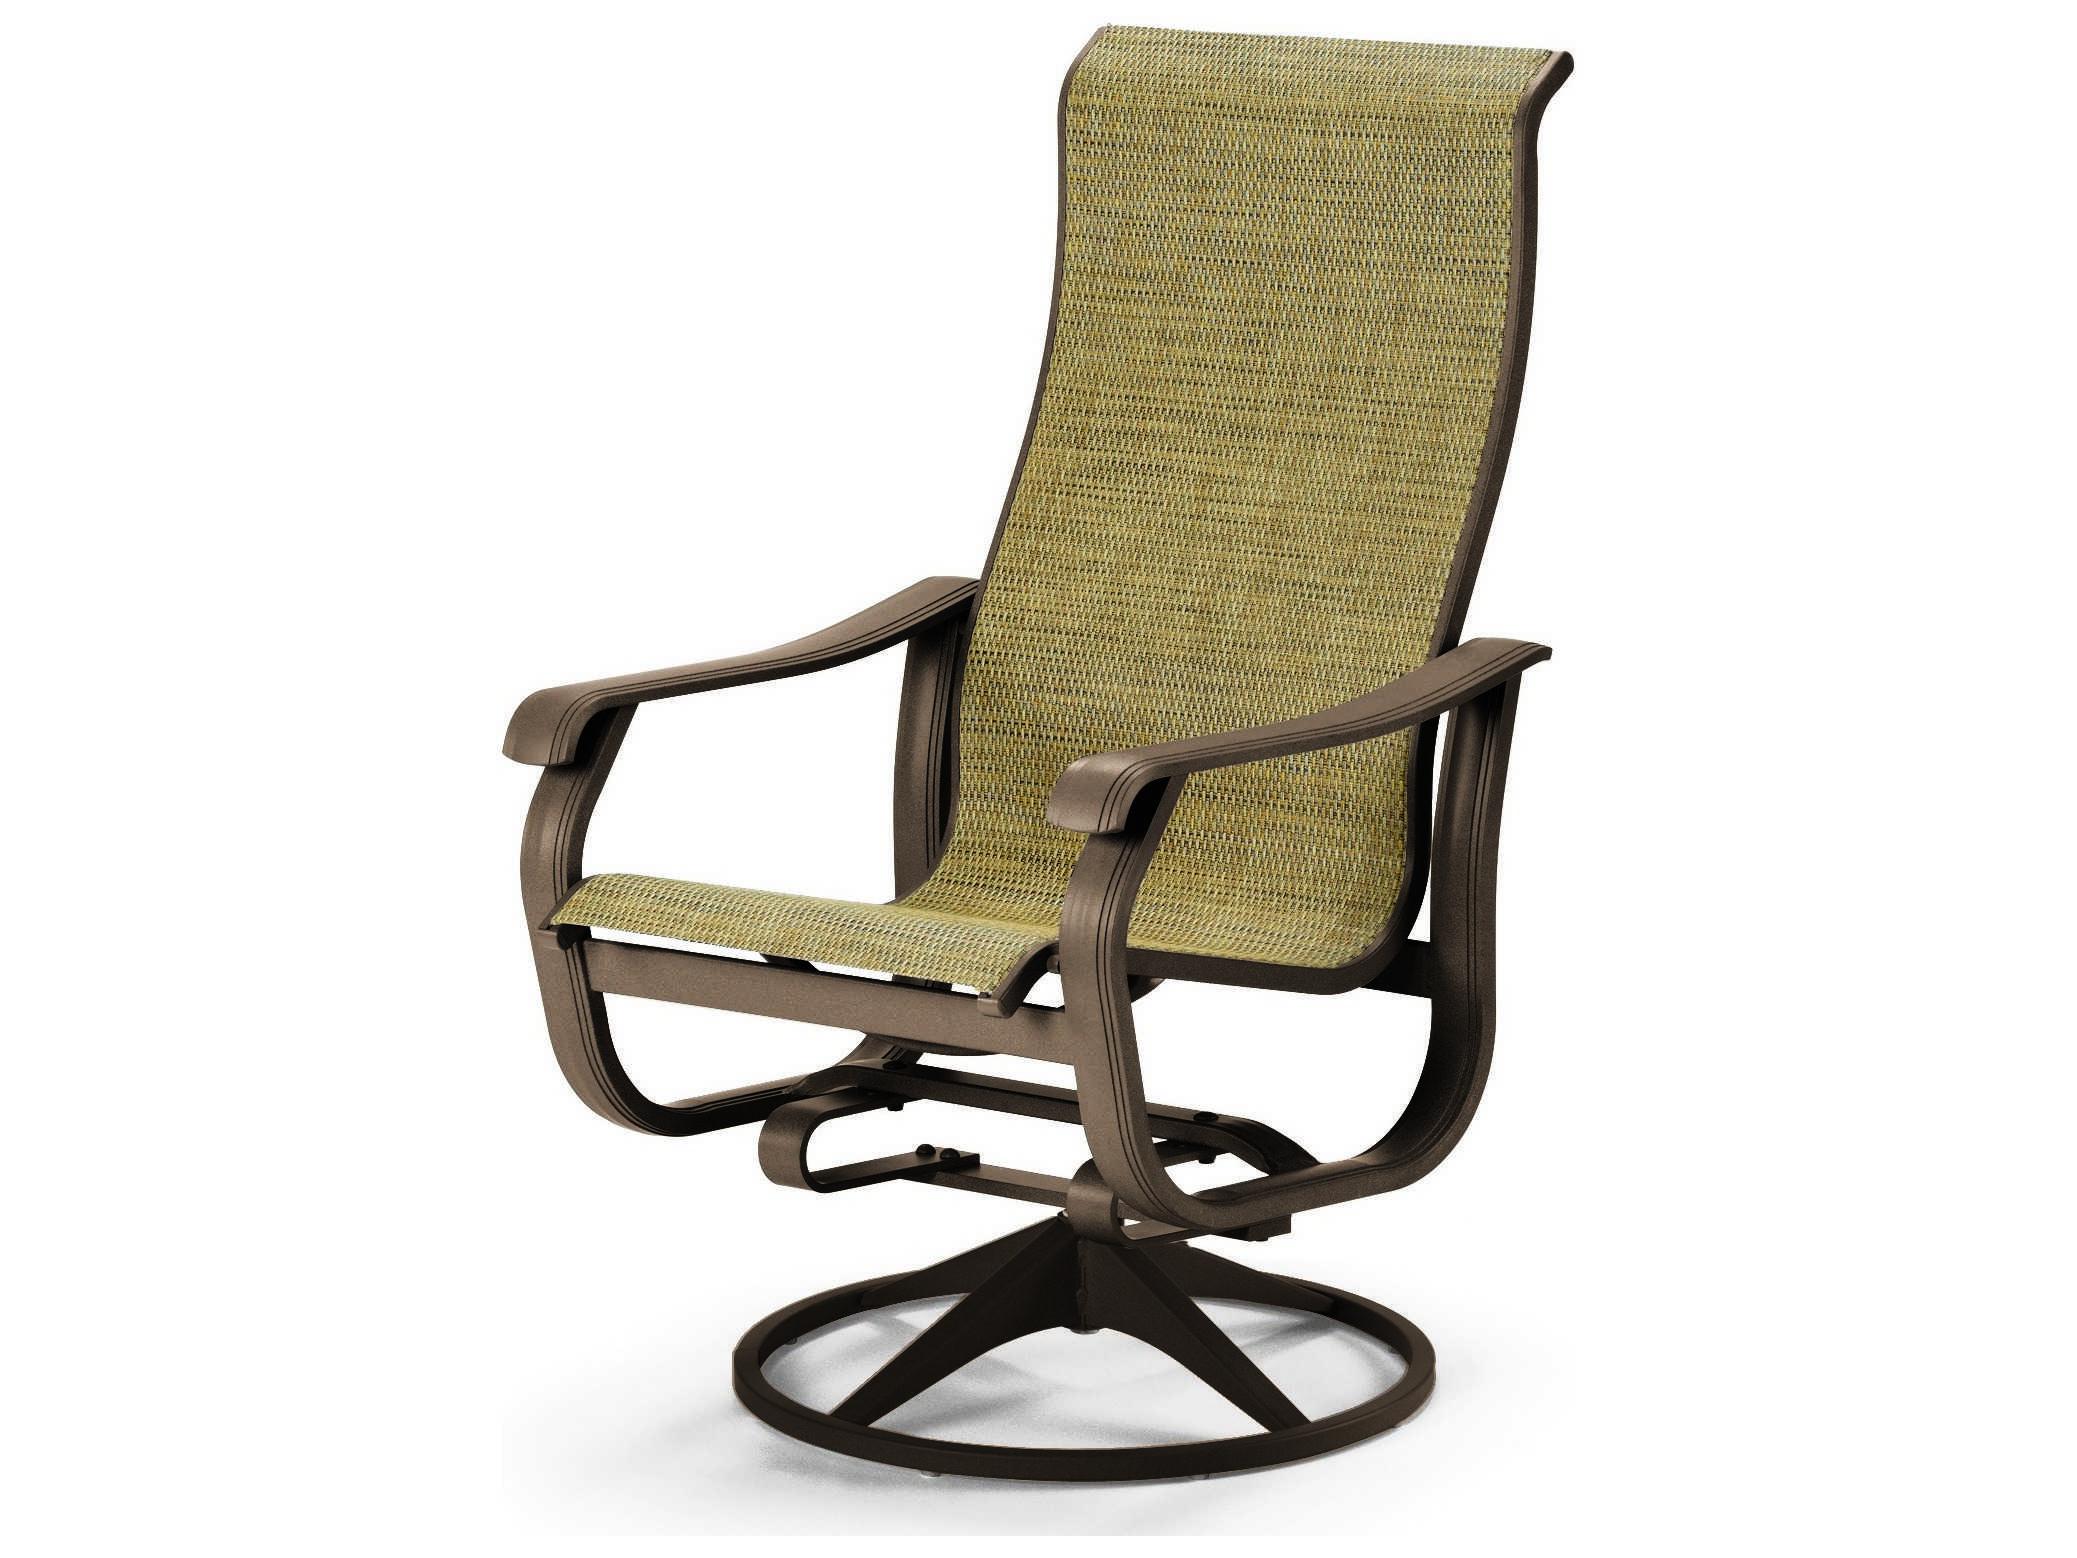 Telescope Casual Villa Sling Supreme Swivel Rocker Lounge Chair